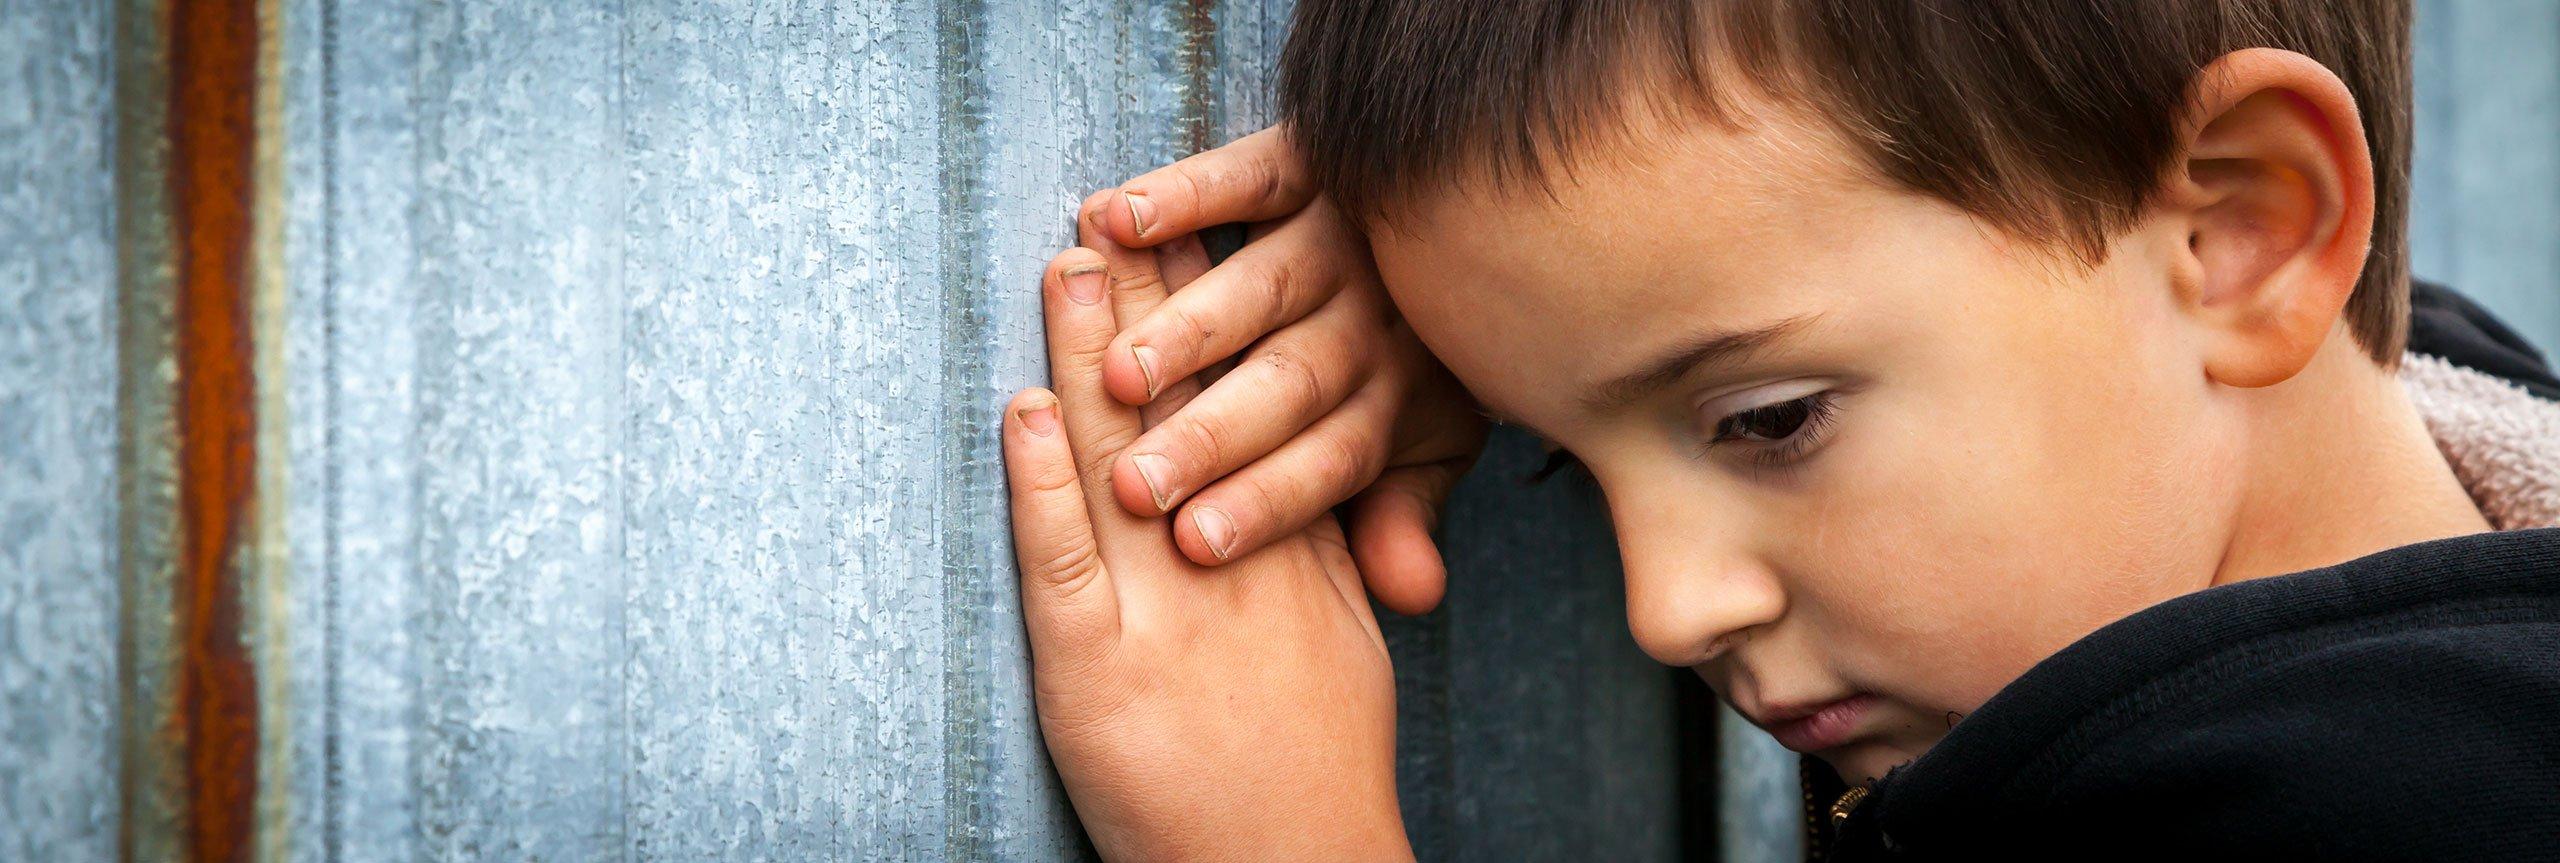 Child custody during the divorce process